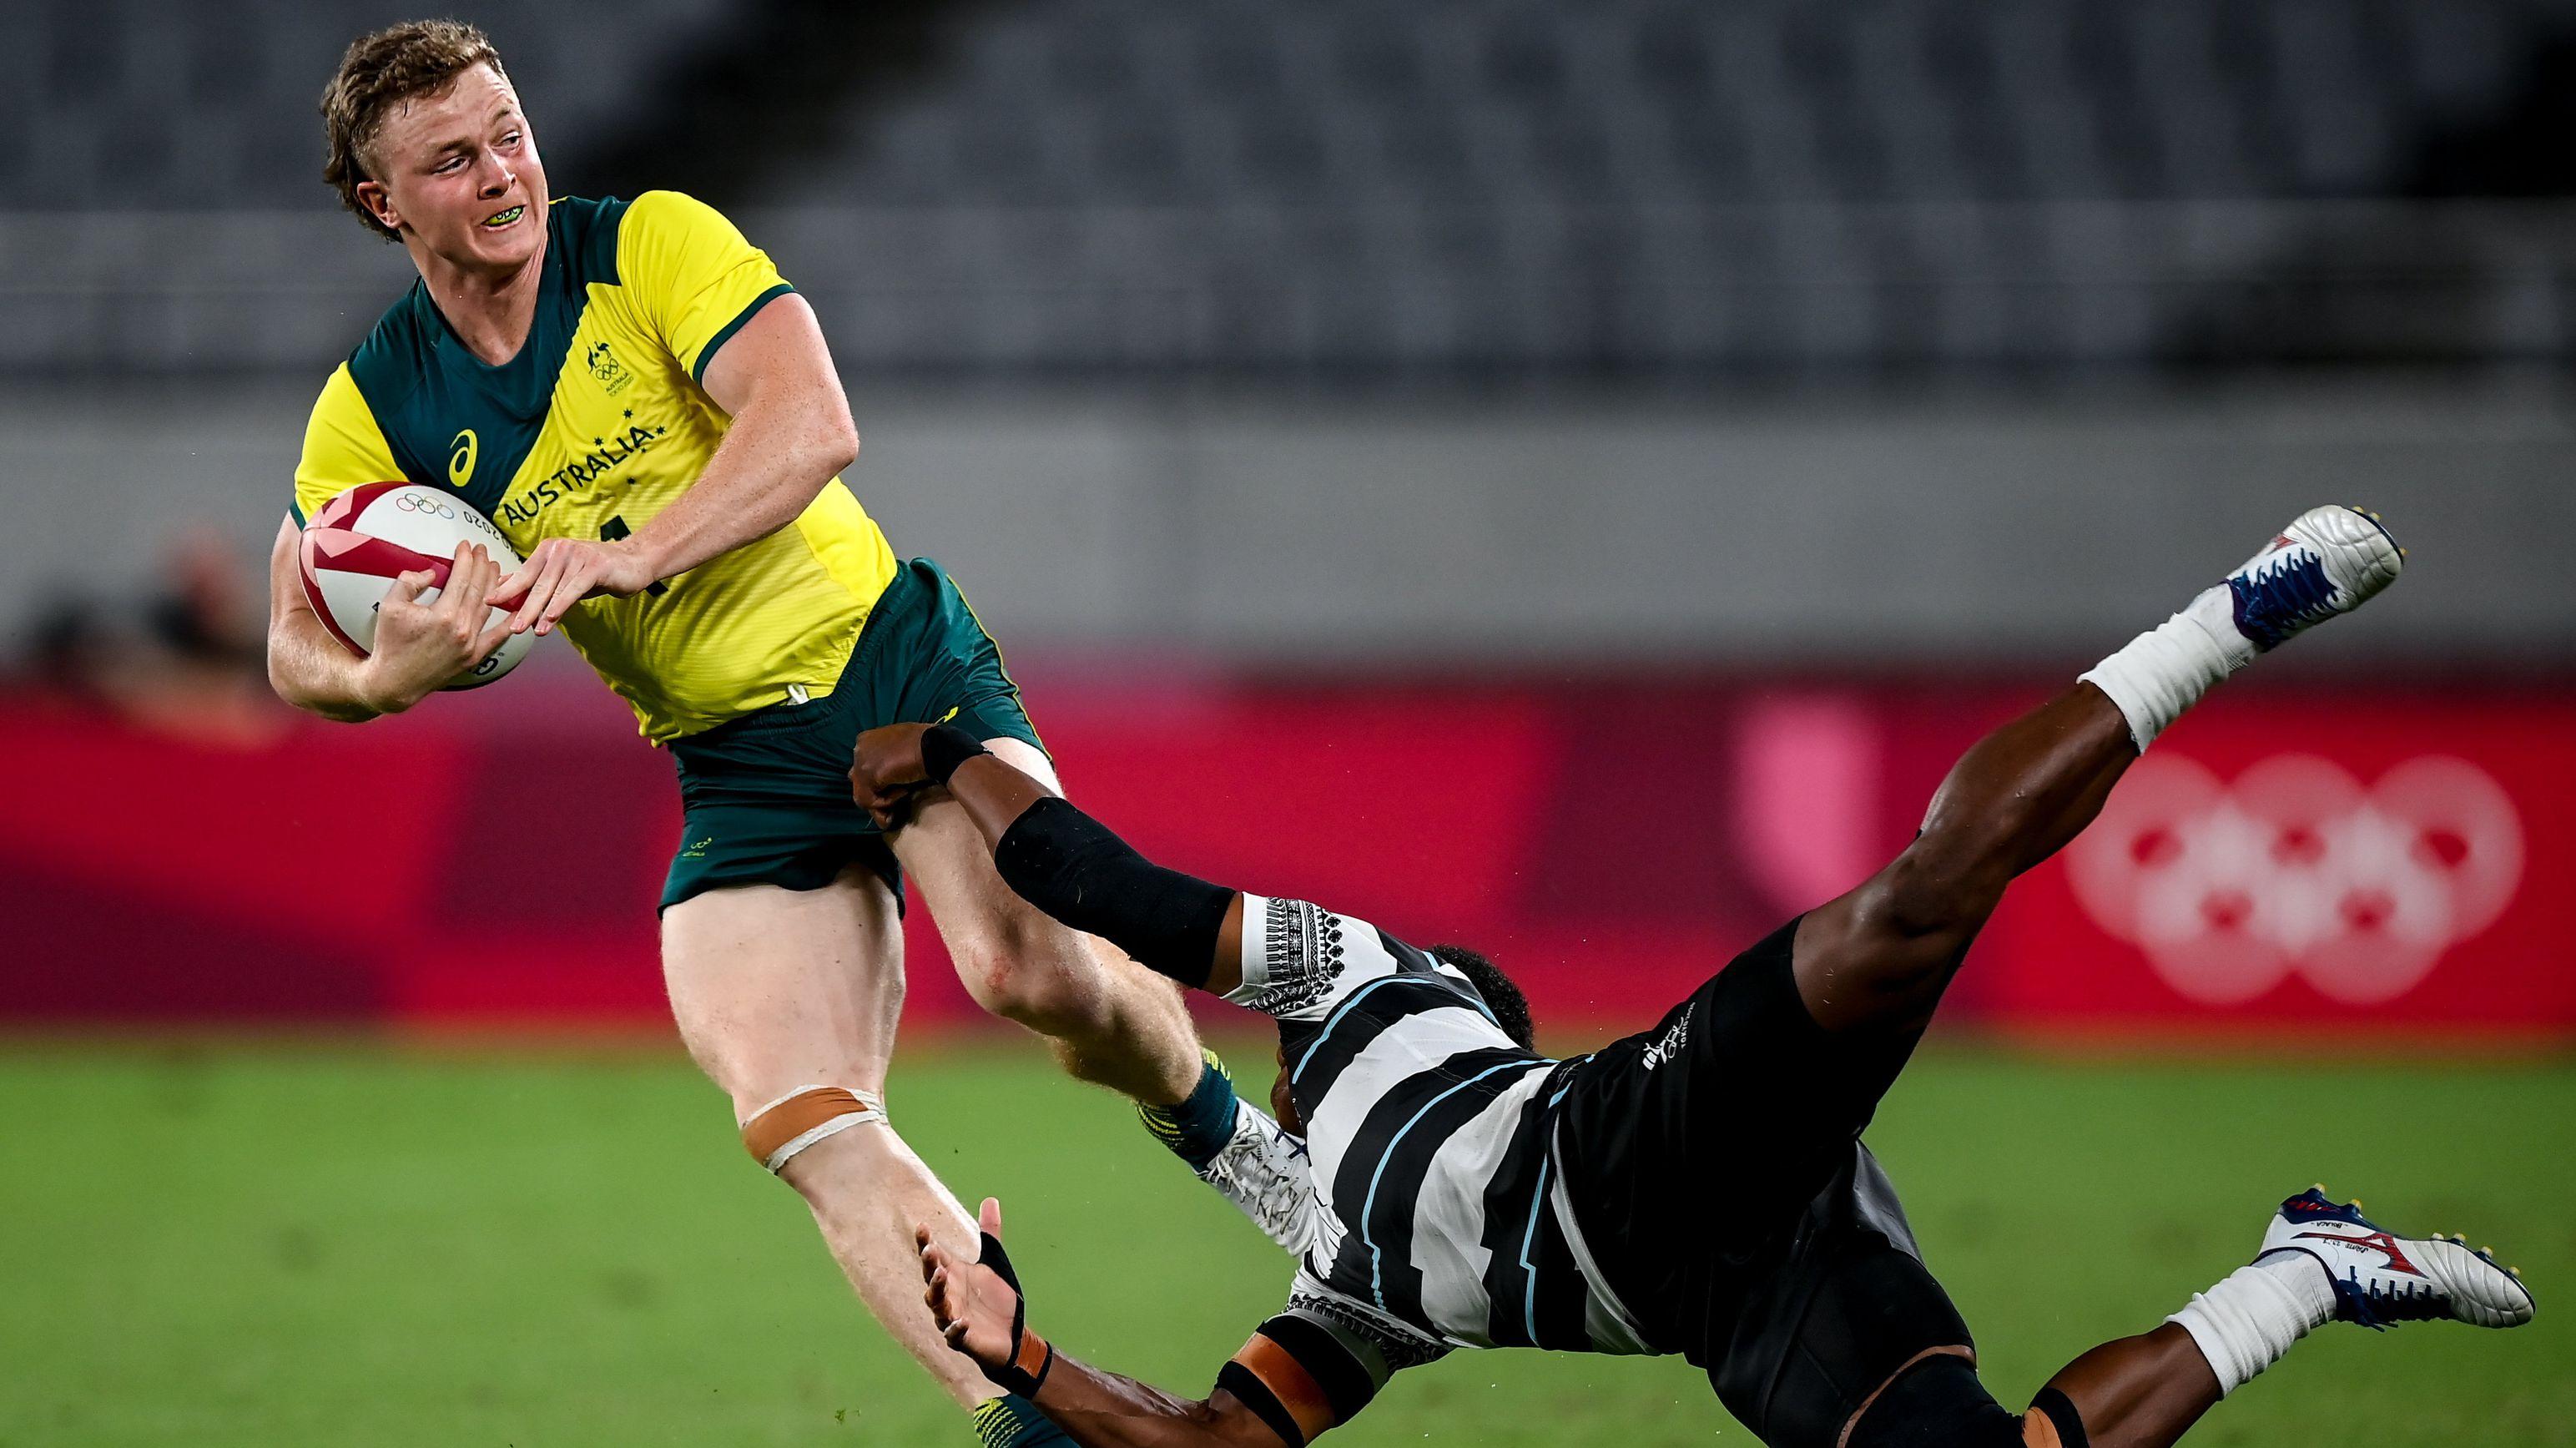 Australia's Henry Hutchinson is tackled by Fiji's Bolaca Napolioni.